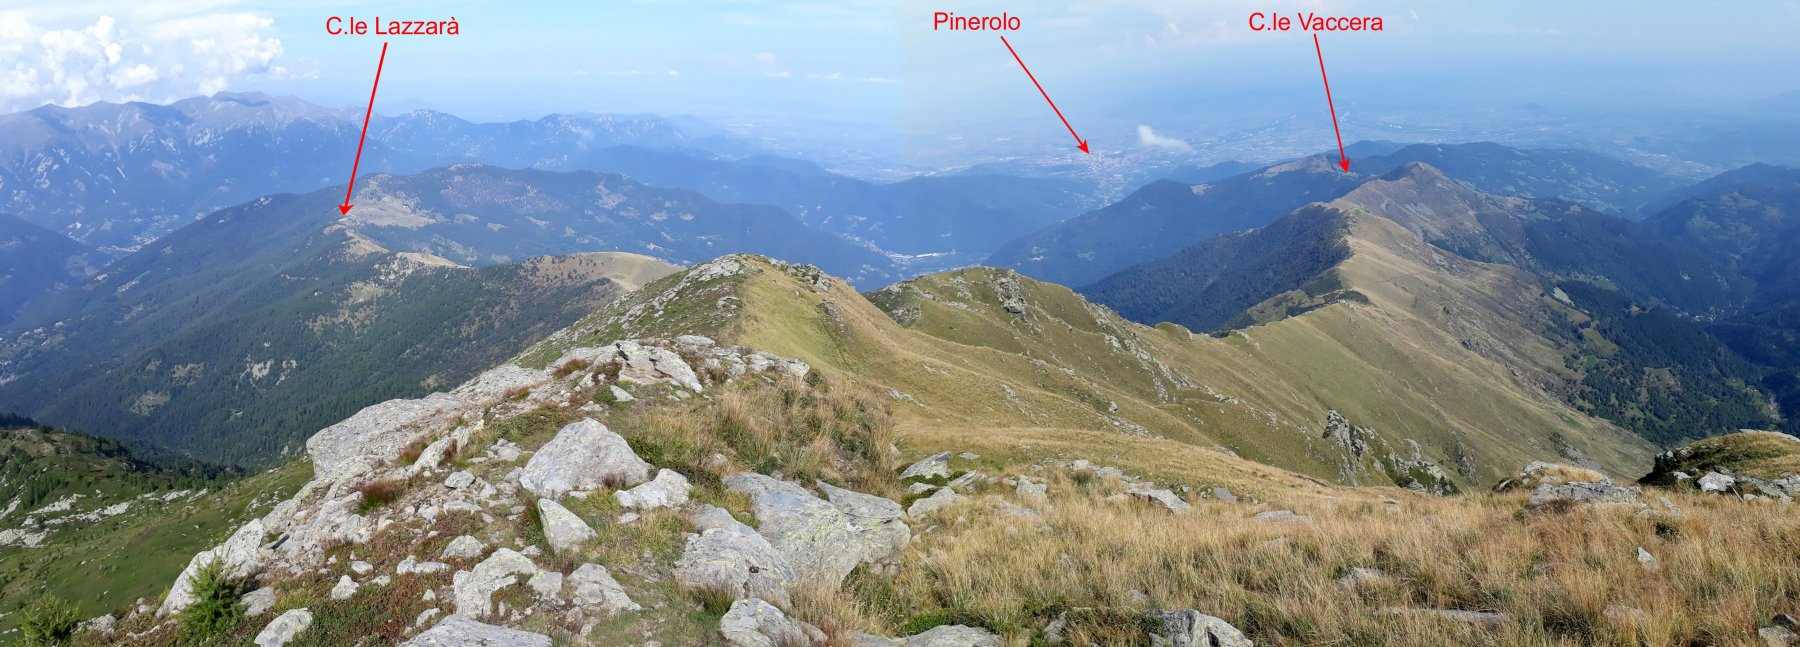 panorama sulla pianura Pinerolese